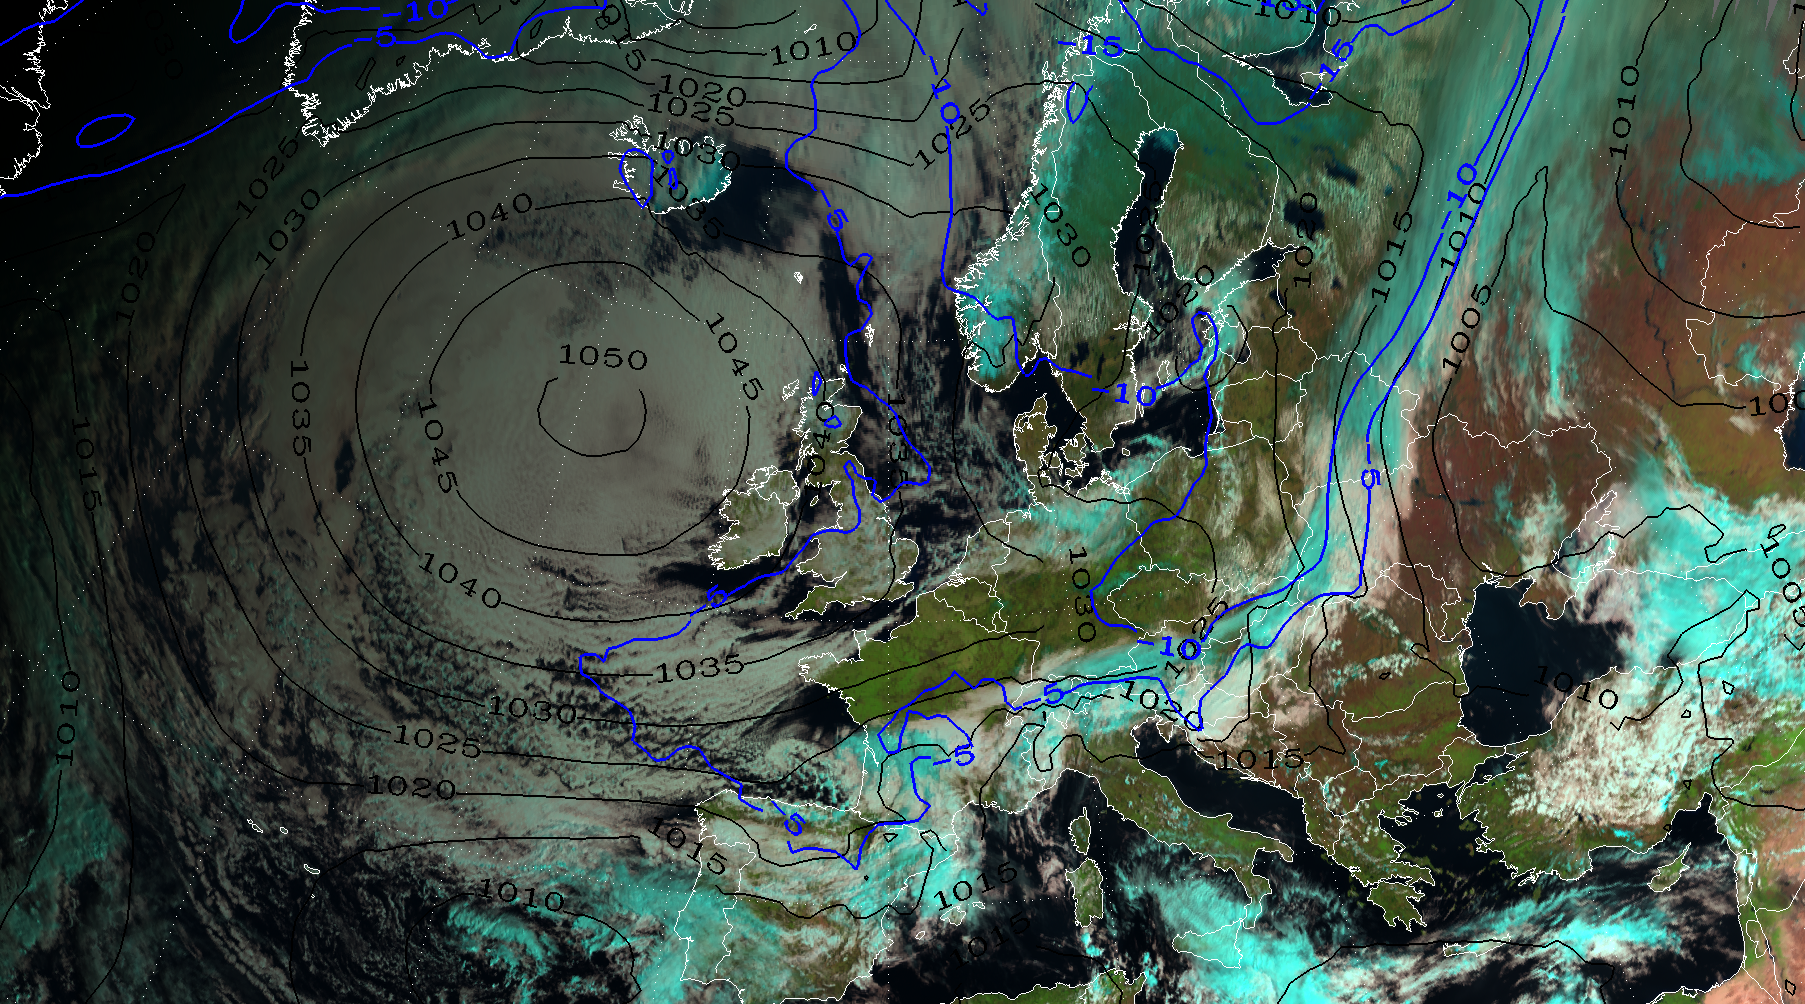 Natural Colour RGB with ECMWF Mean Sea Level Pressure and 850 hPa Temperature overlaid